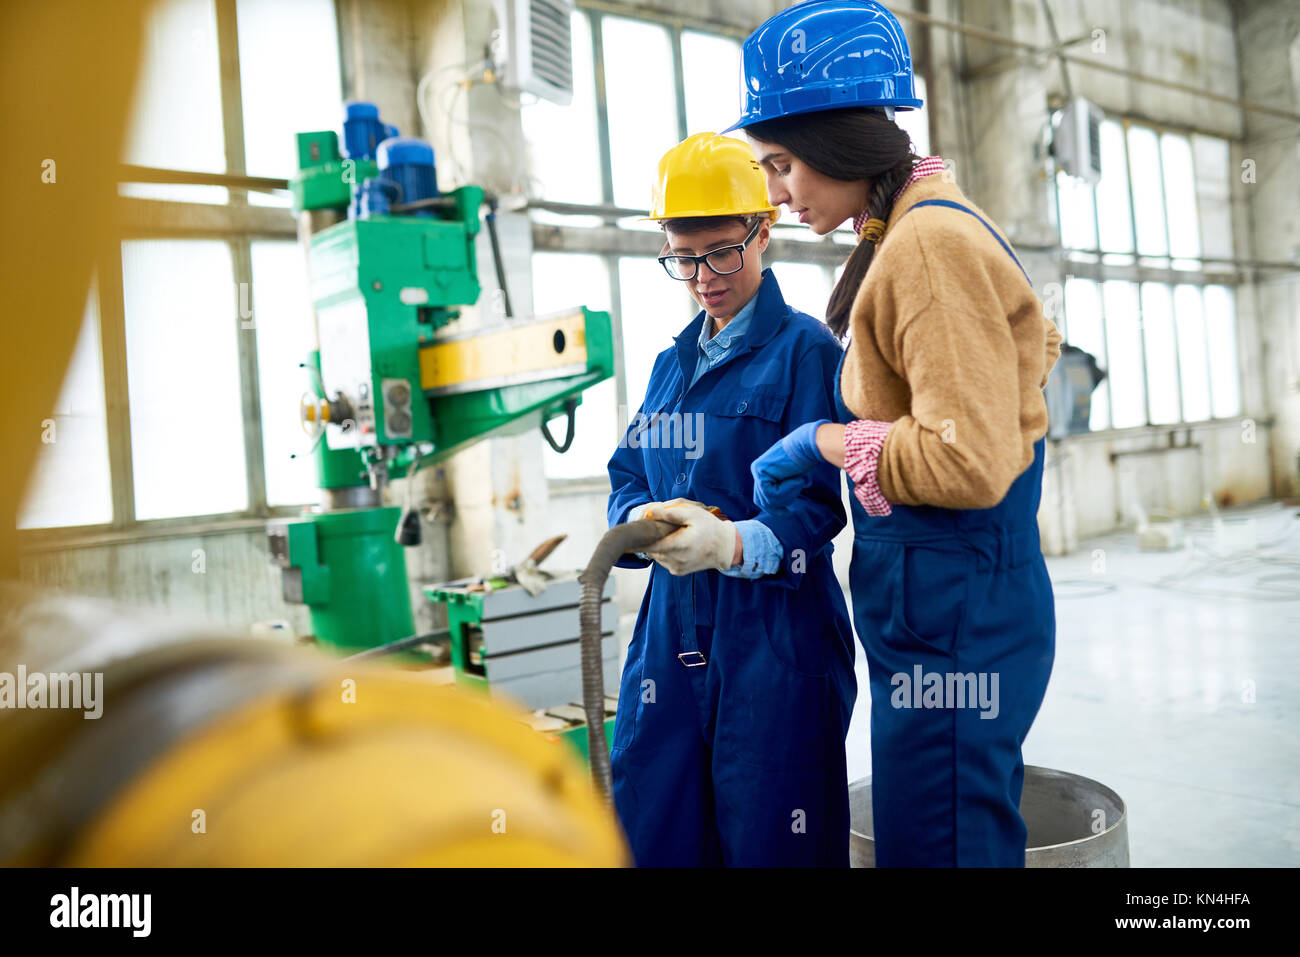 Machine Operators Solving Problem Together - Stock Image